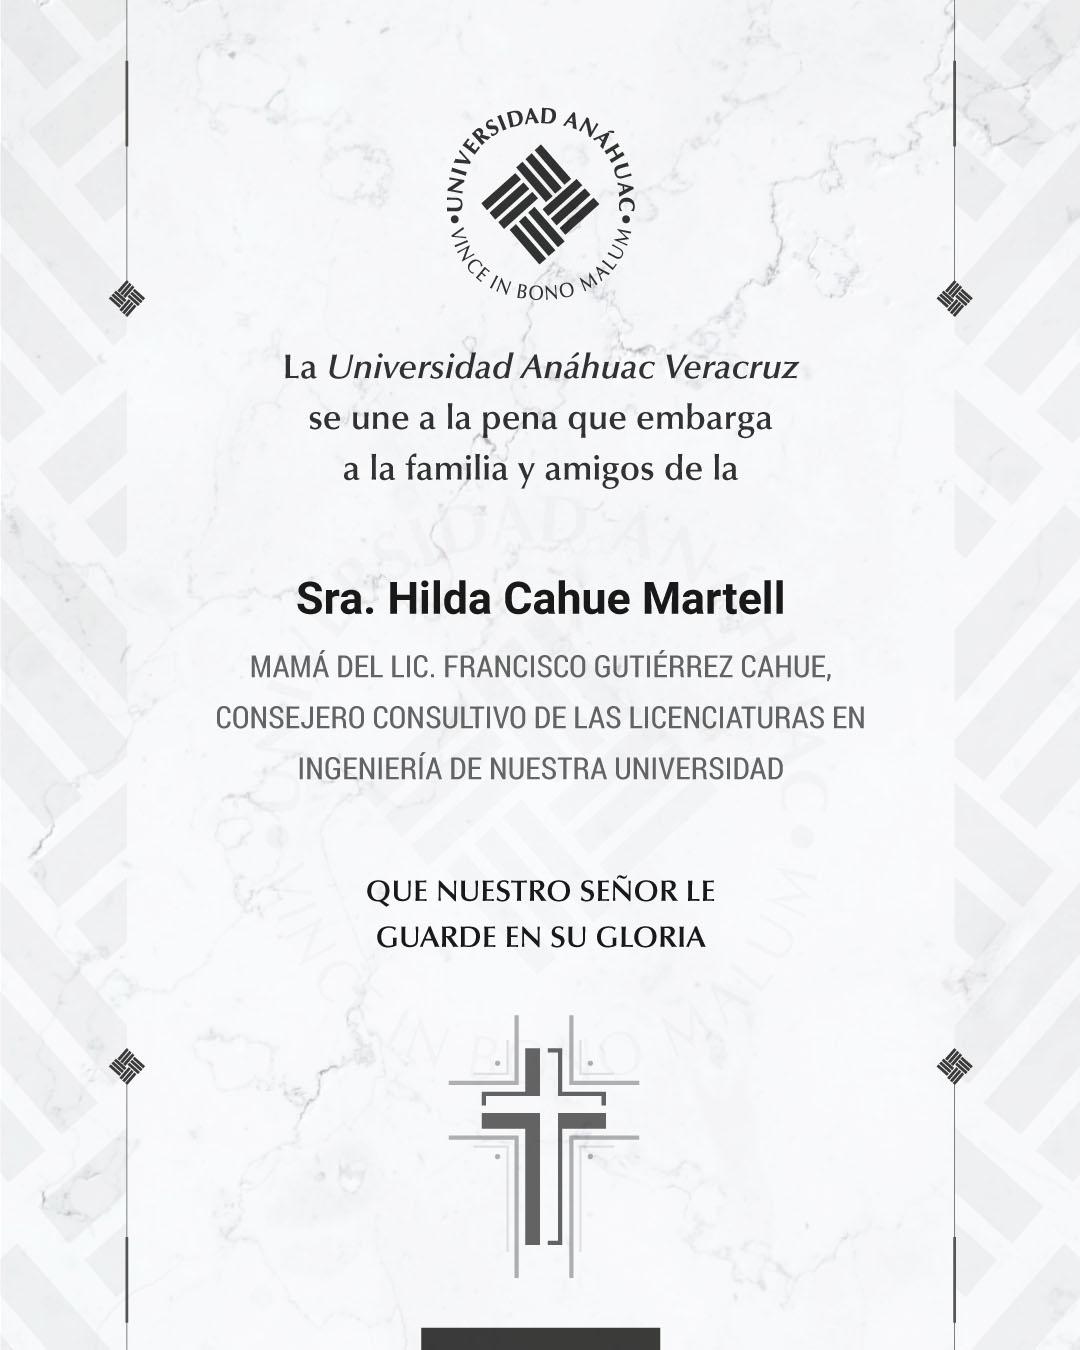 8 / 14 - Sra. Hilda Cahue Martell